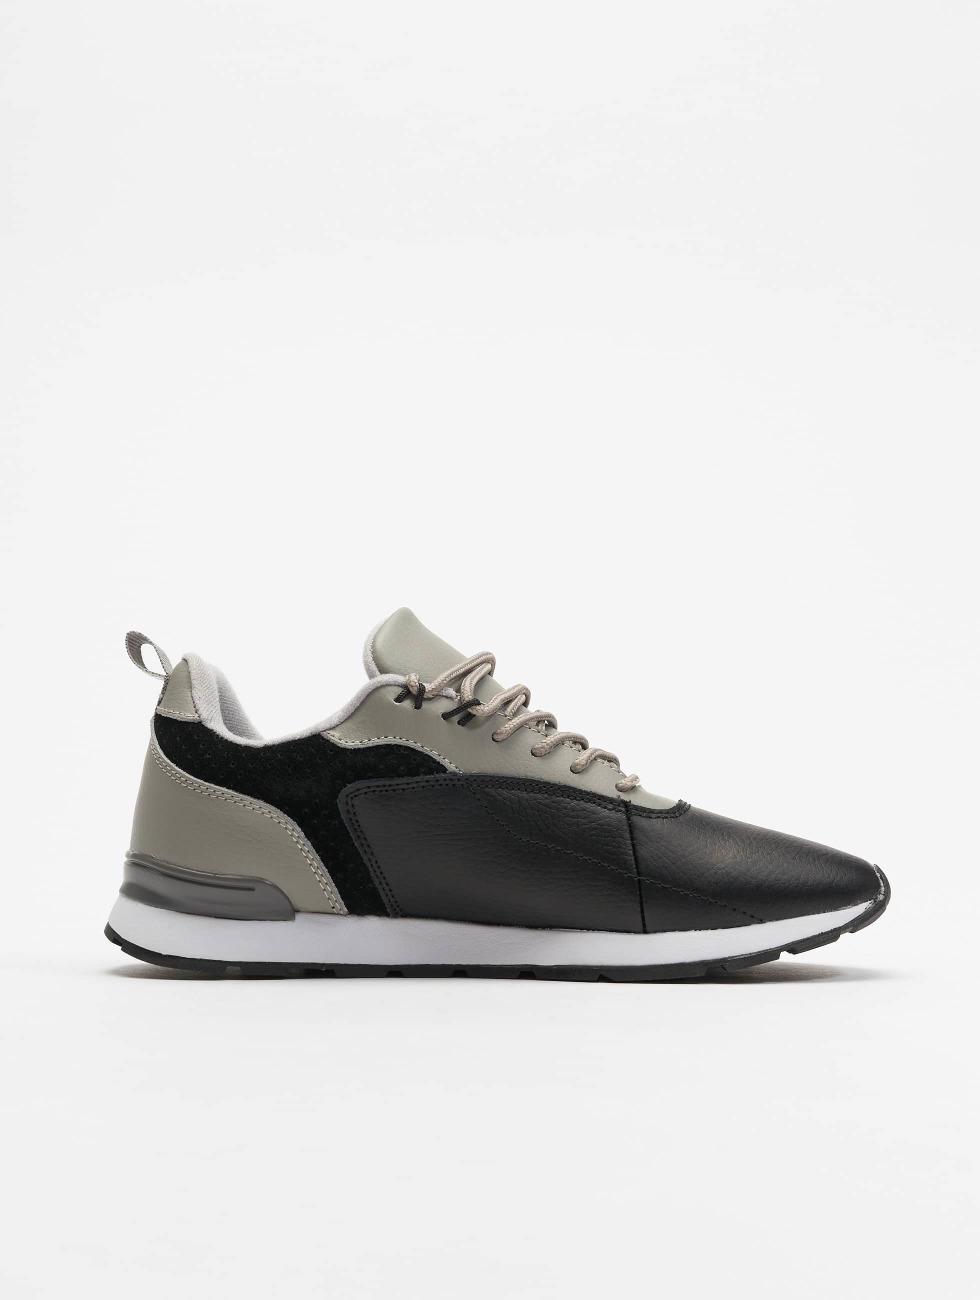 Thug Scarpa Vita / Sneaker Forte Nero 395.506 4tPNekQV9Q